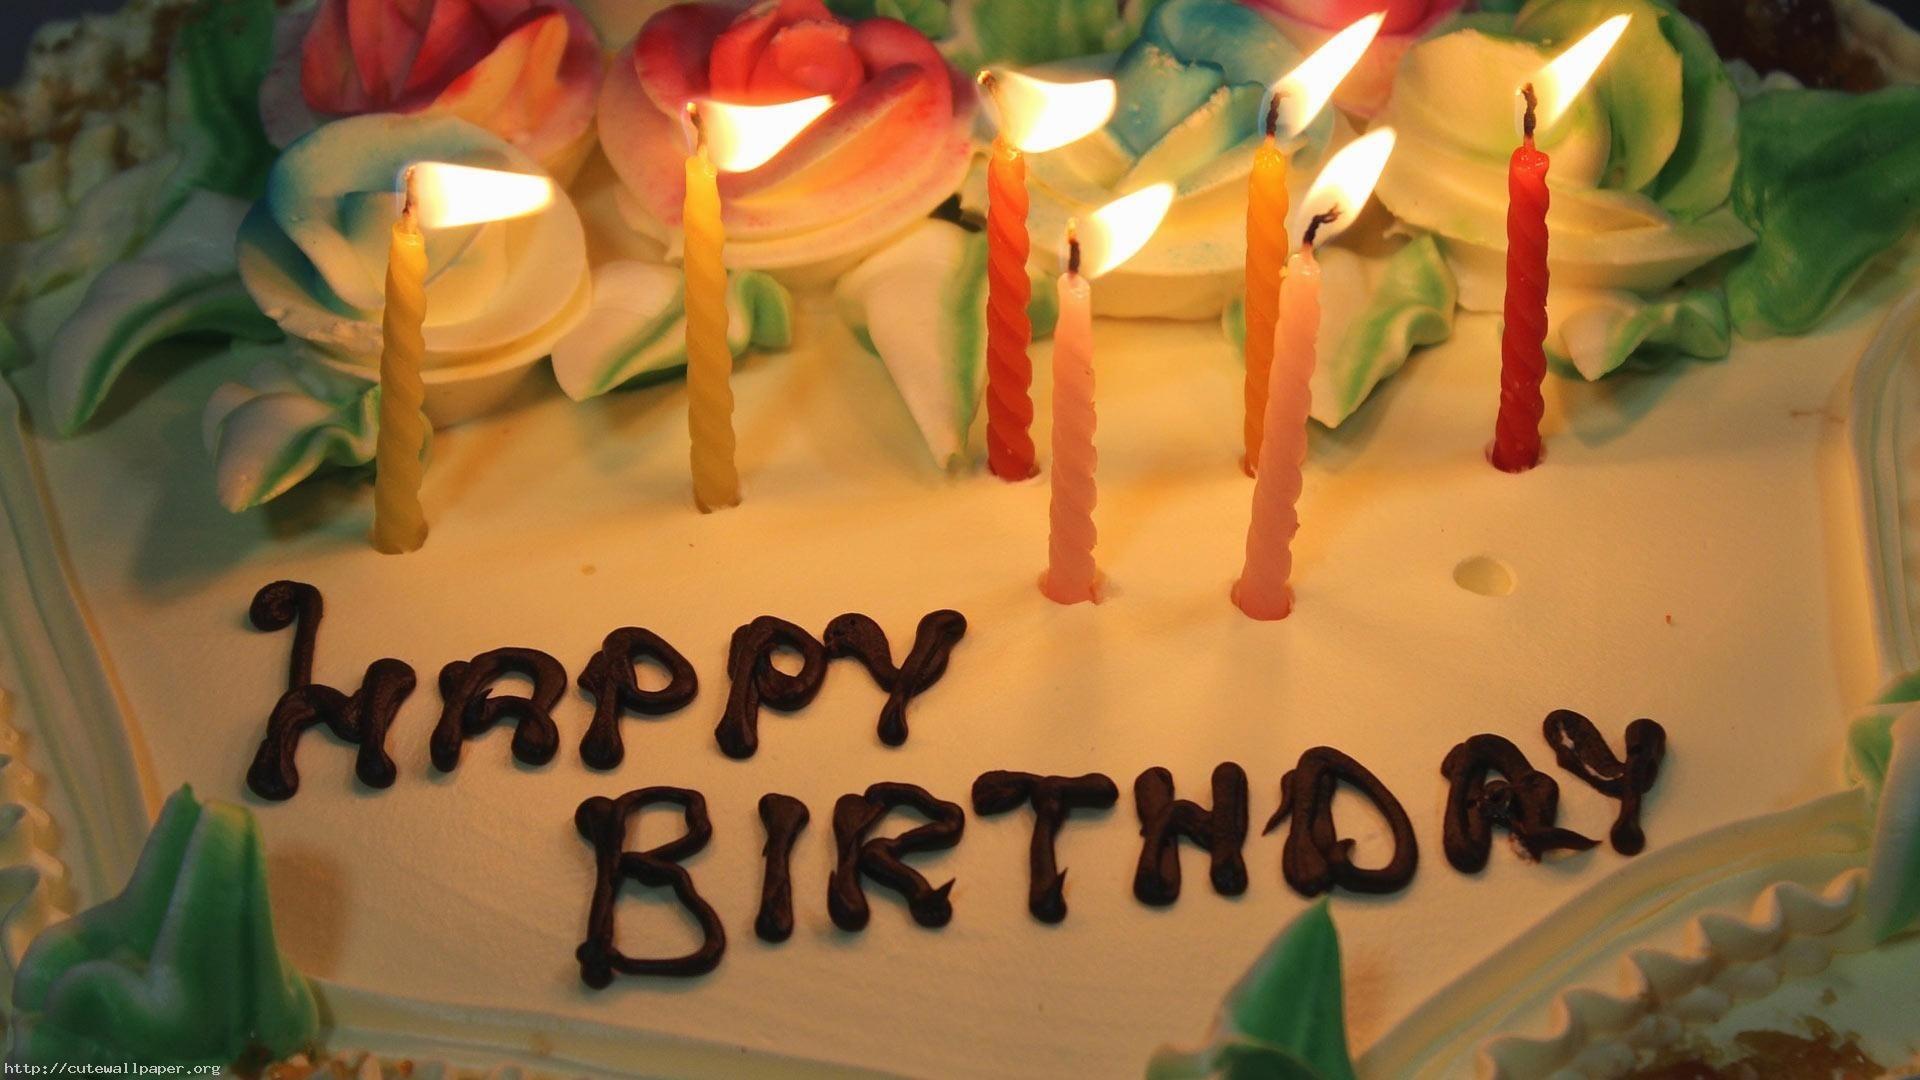 1920x1080 Free Happy Birthday Wallpaper Group 1920a 1200 Birthday Hd Wallpapers 1080p 1920x1080 Wallpaper Teahub Io